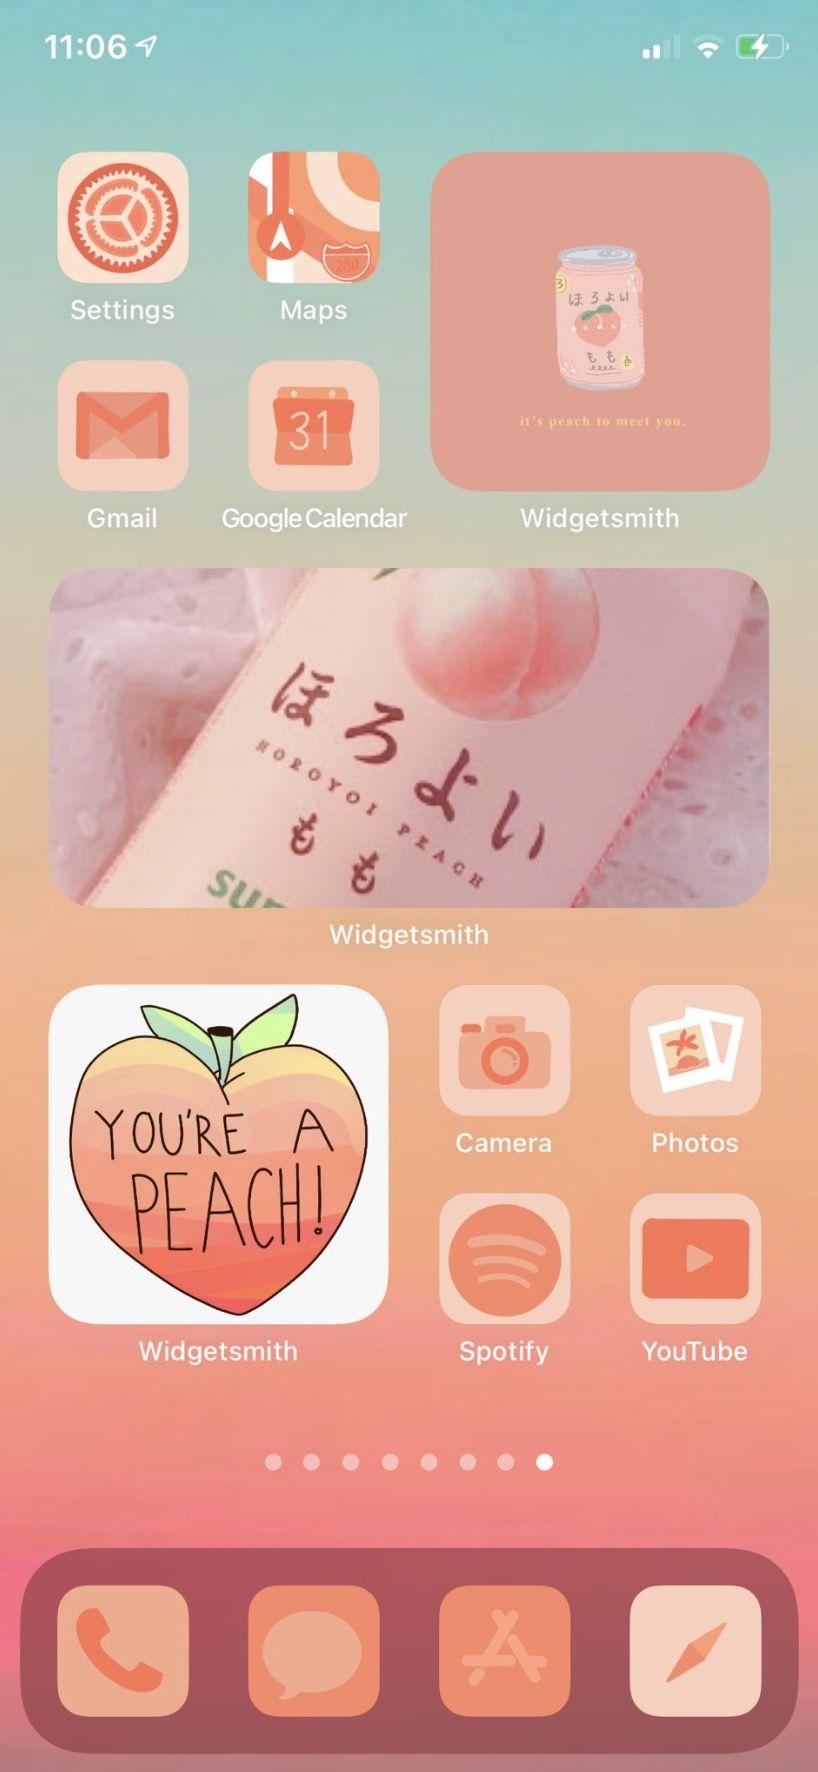 30 Aesthetic Ios 14 6 Home Screen Theme Ideas Gridfiti Iphone Home Screen Layout Homescreen Iphone Layout